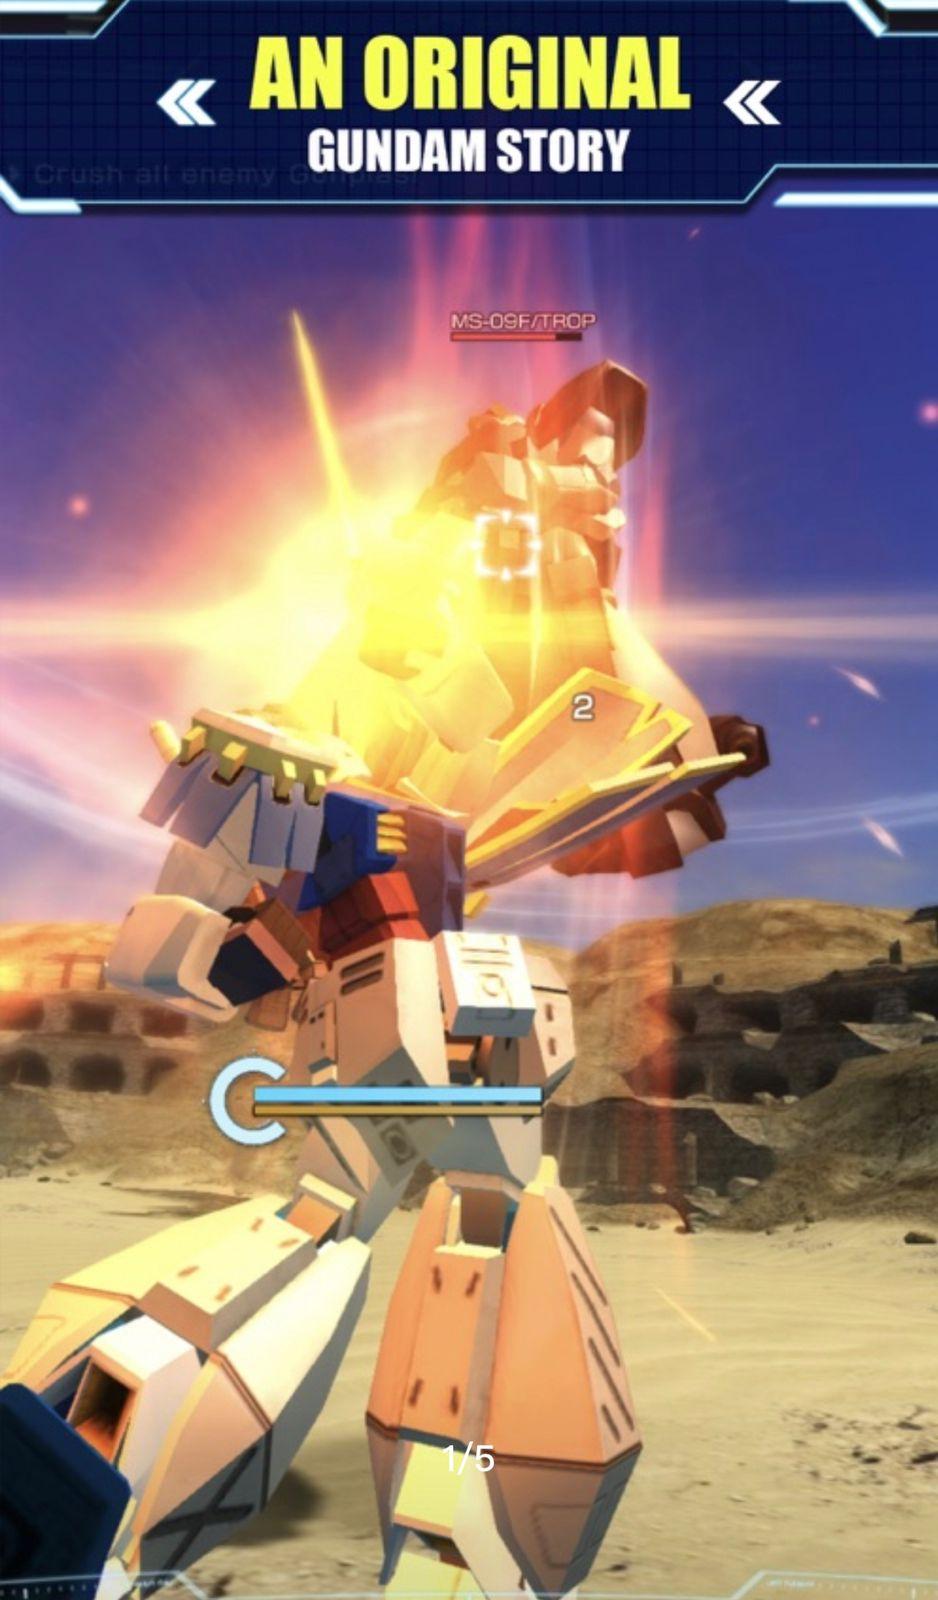 gundam battle UI